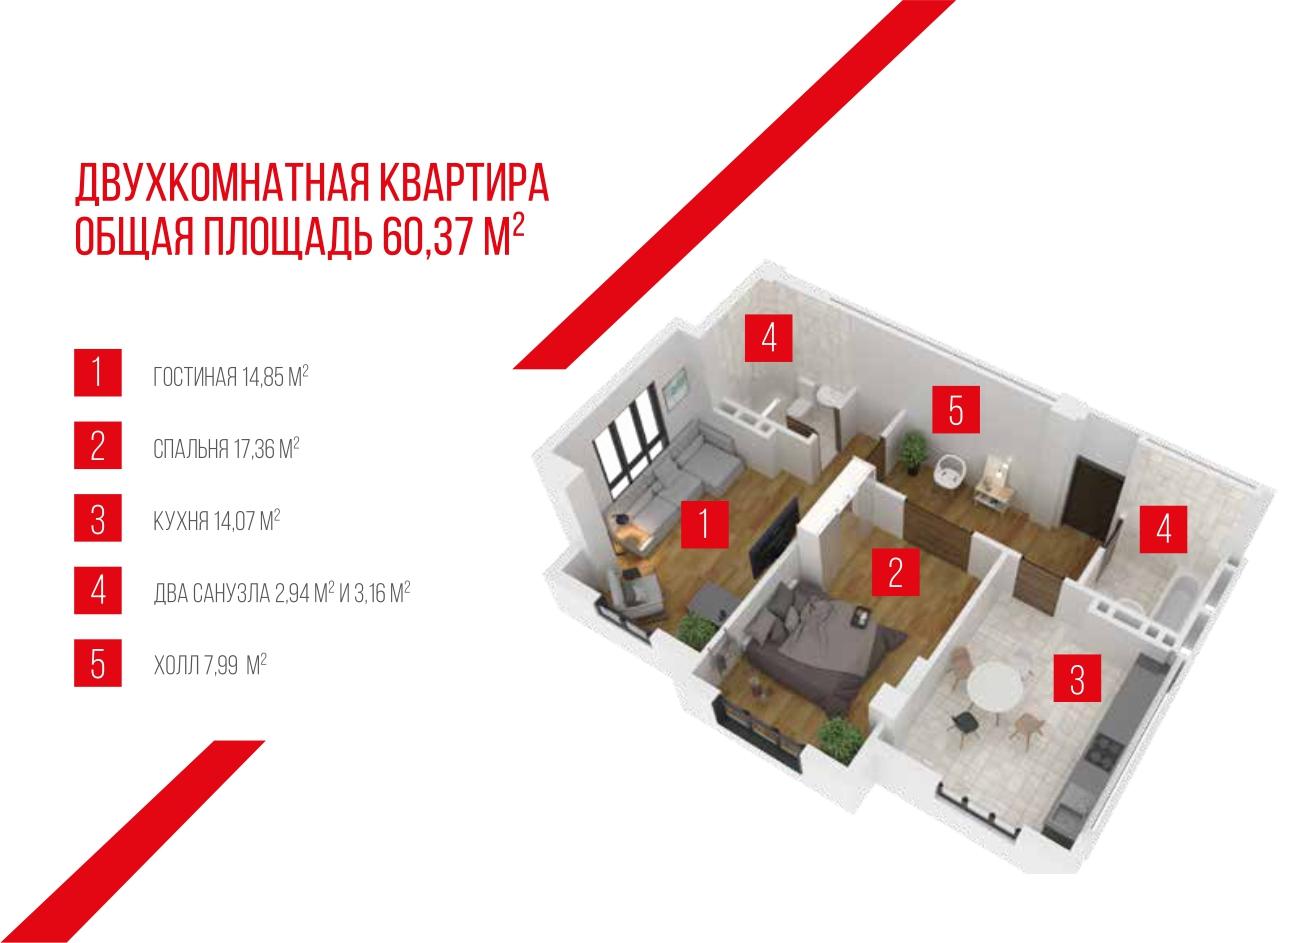 2-х комнатная квартира 60,37 кв.м.